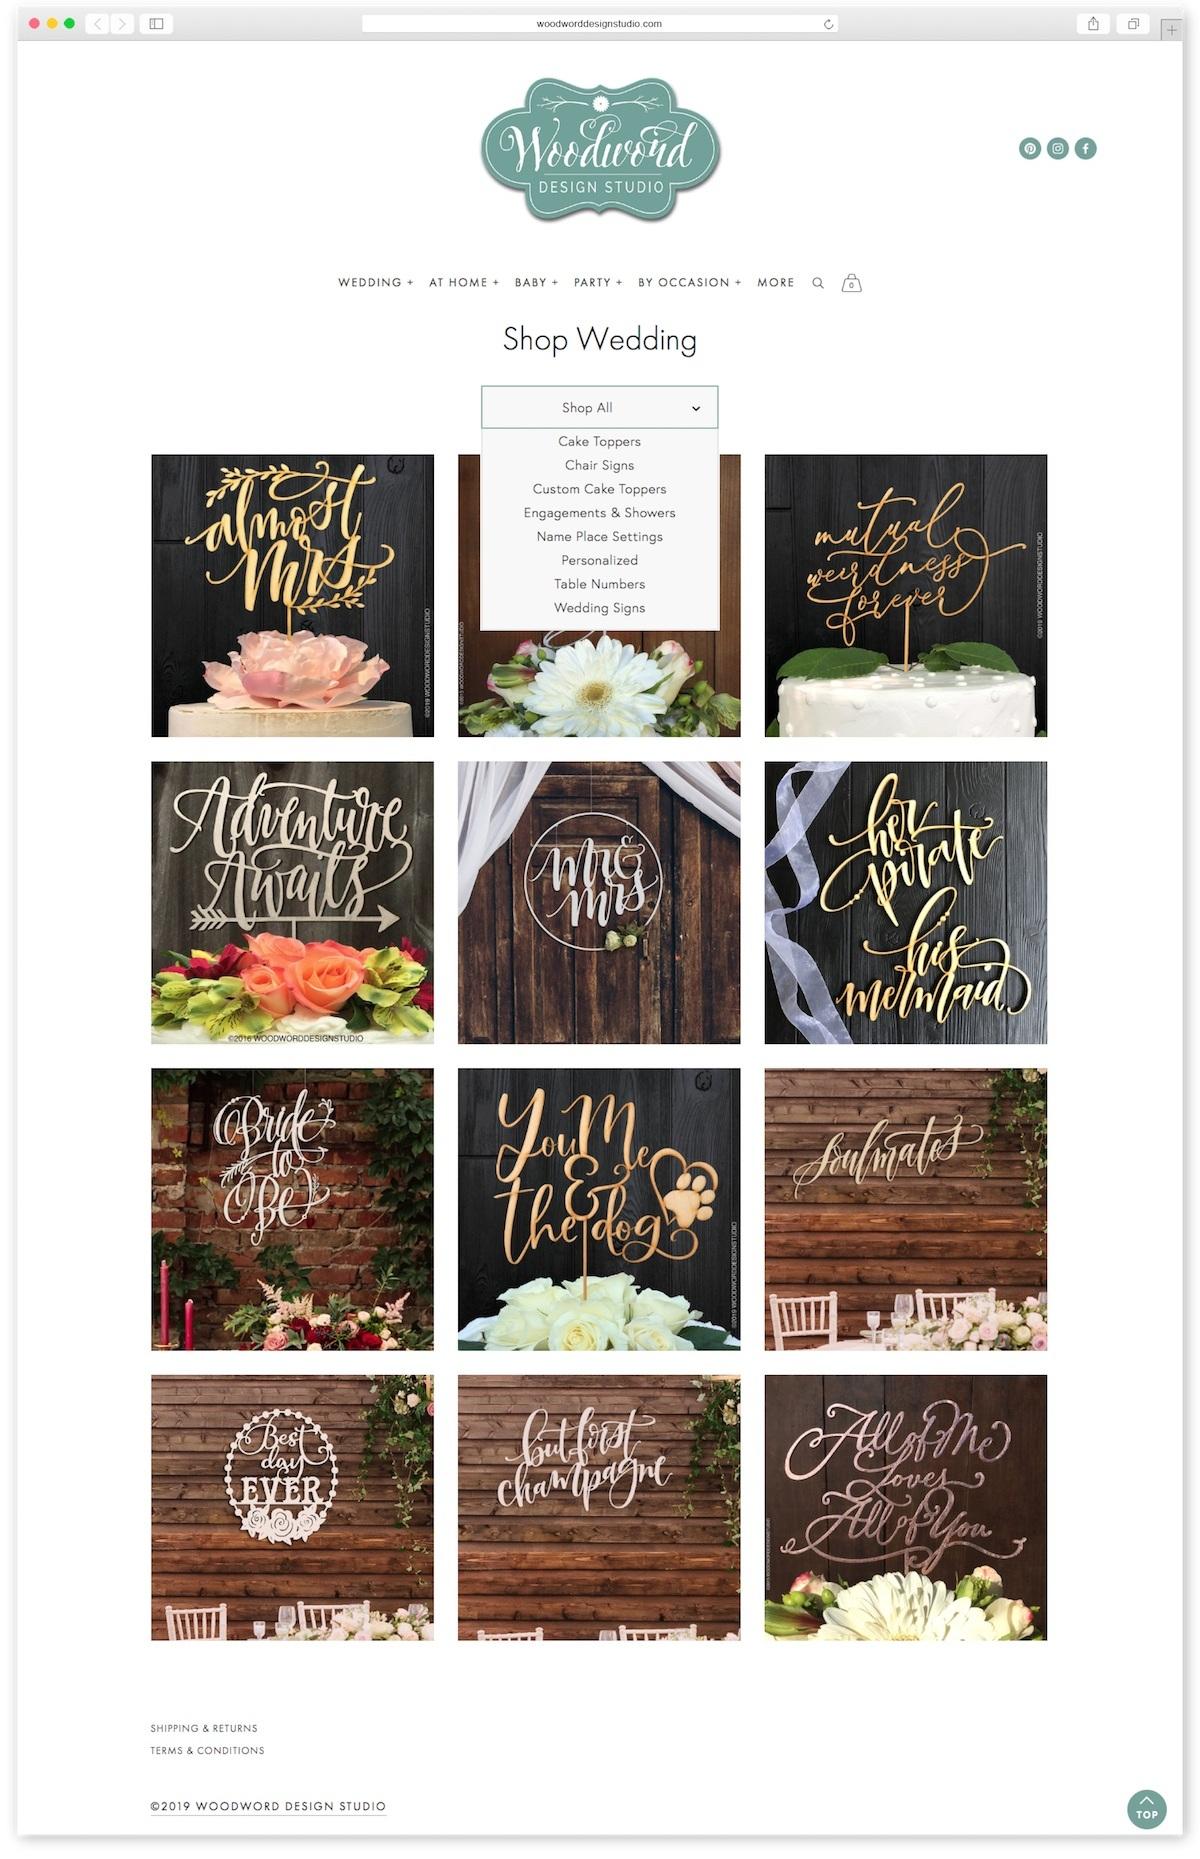 shop-wedding-1.png